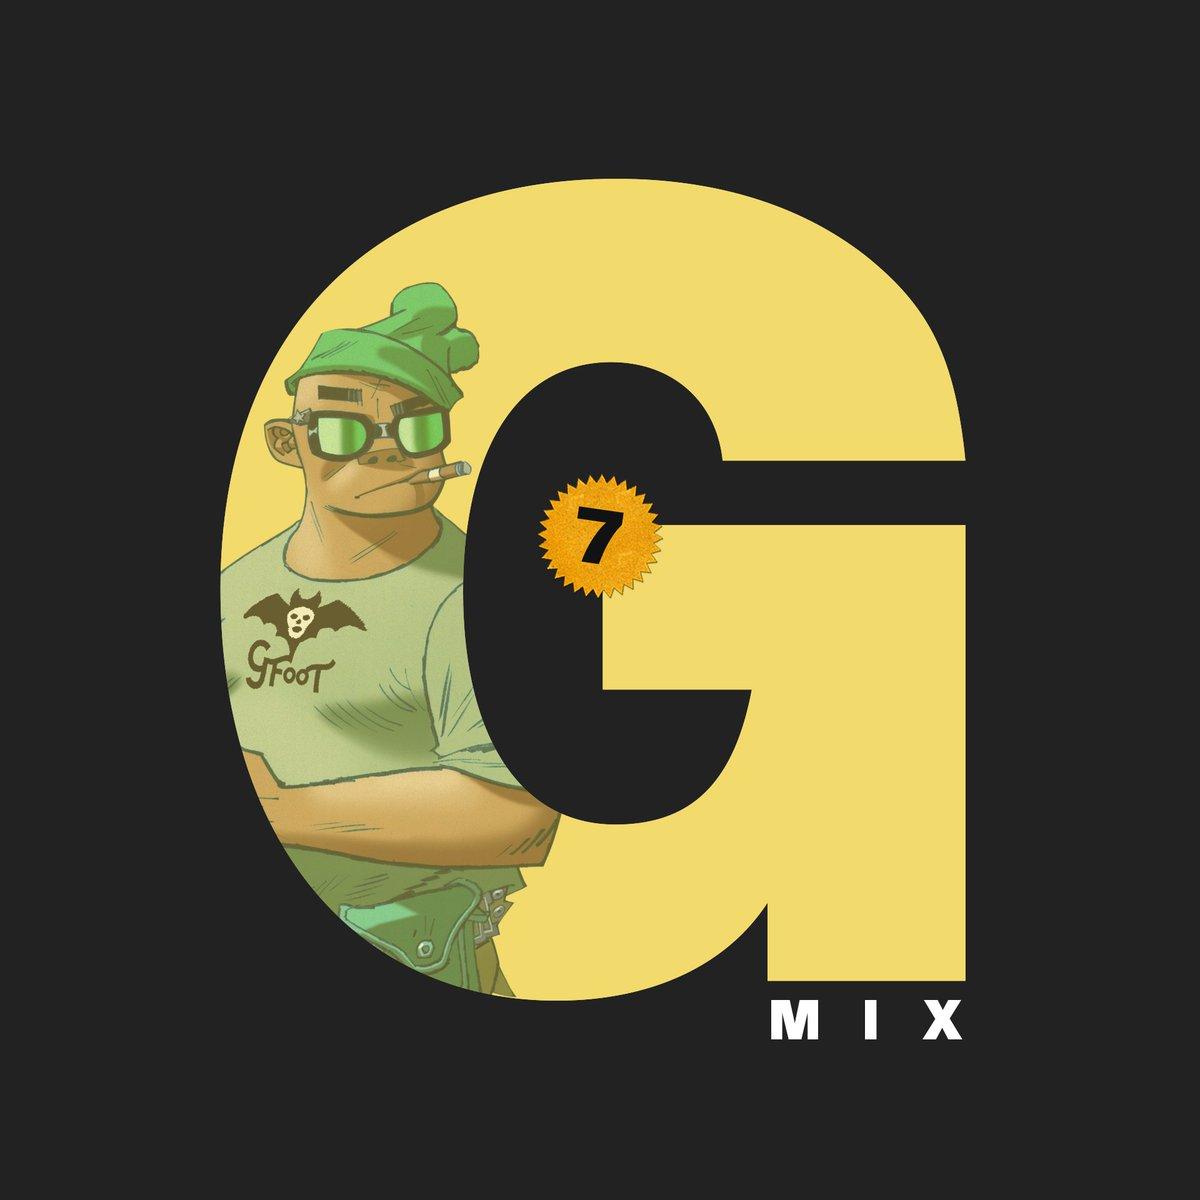 G-Mix: Russel 7